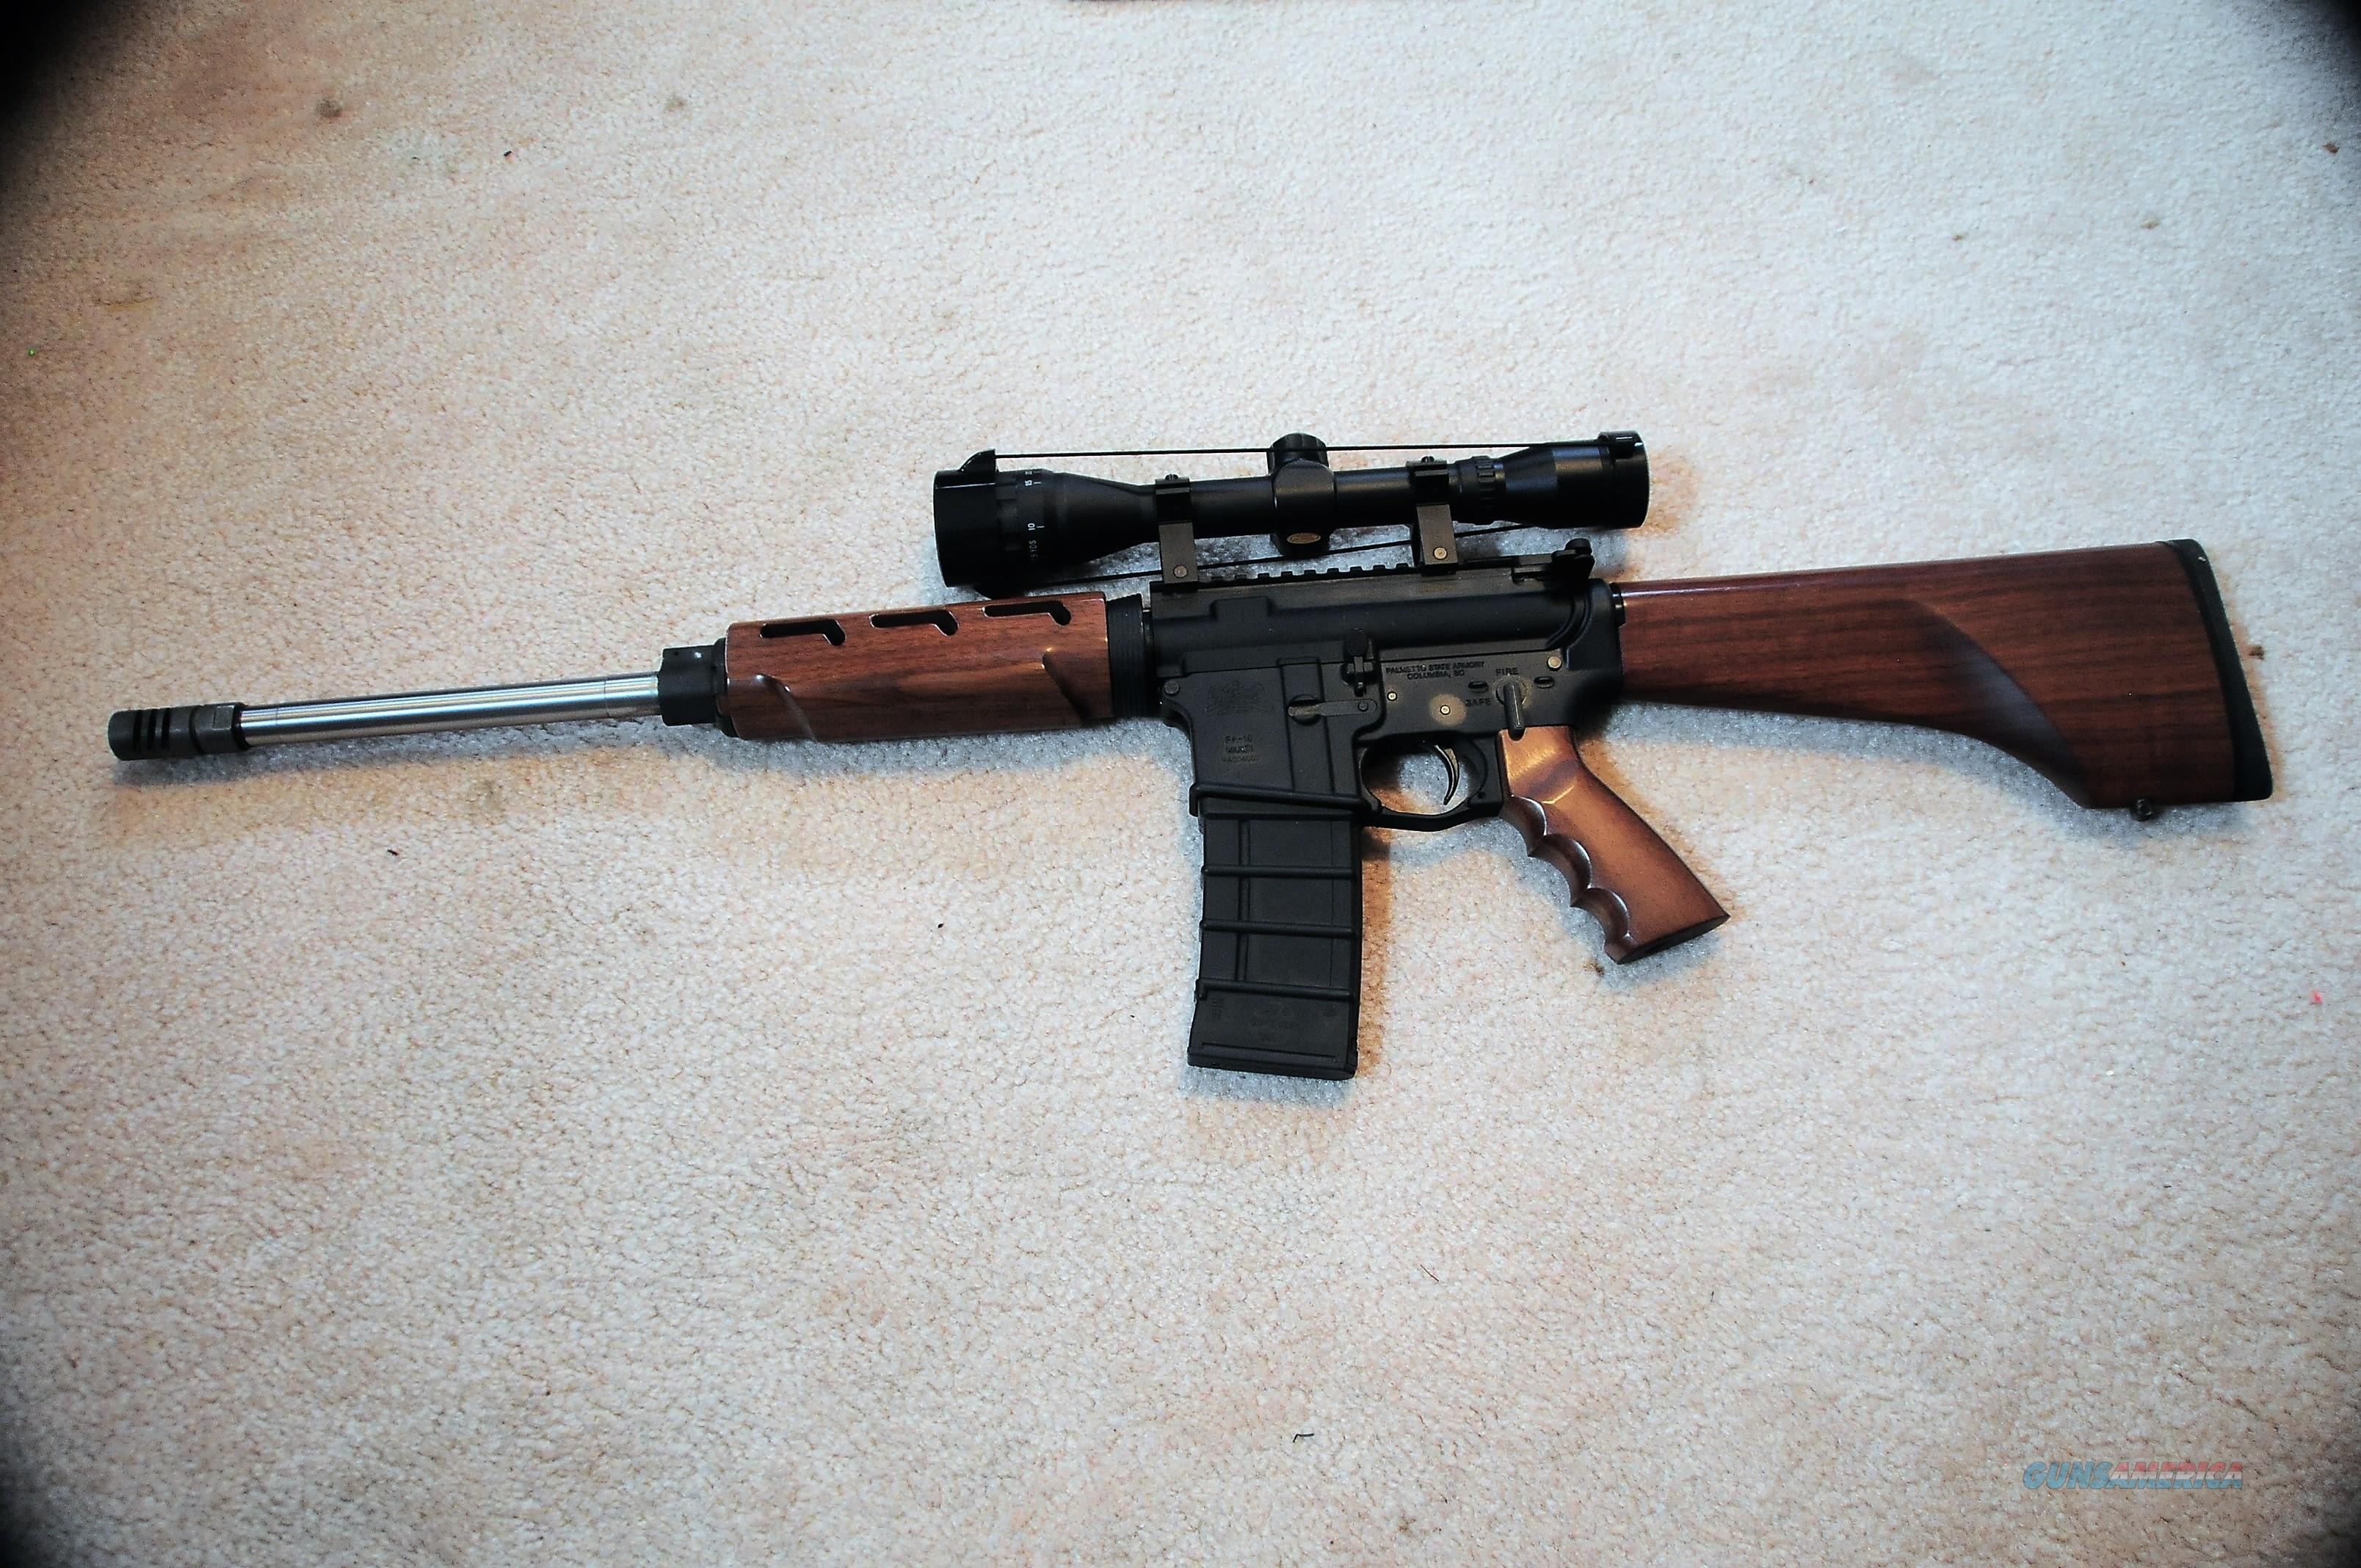 Walnut Stocked AR15  Guns > Rifles > AR-15 Rifles - Small Manufacturers > Complete Rifle